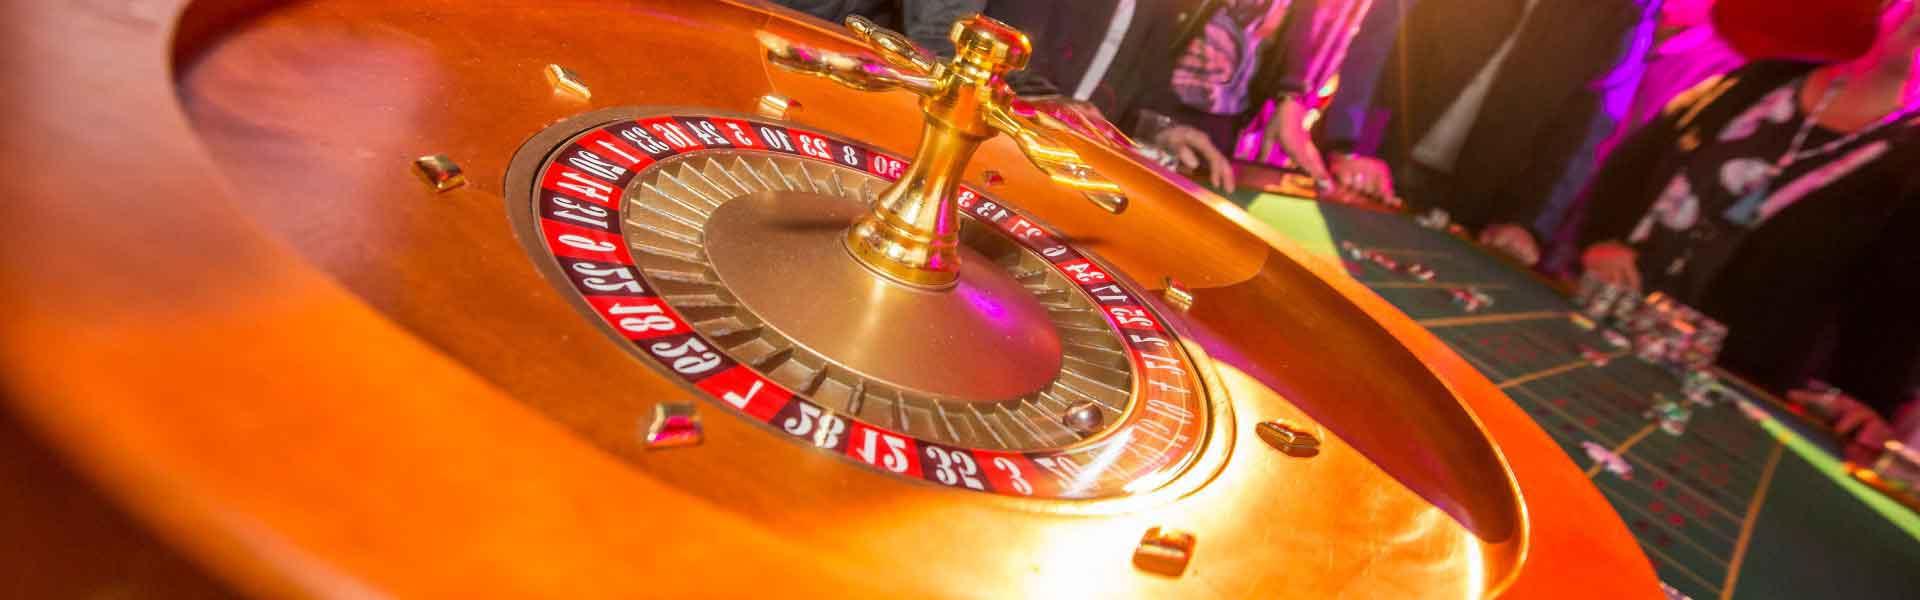 Casino avond | Bedrijfsuitjes in Twente